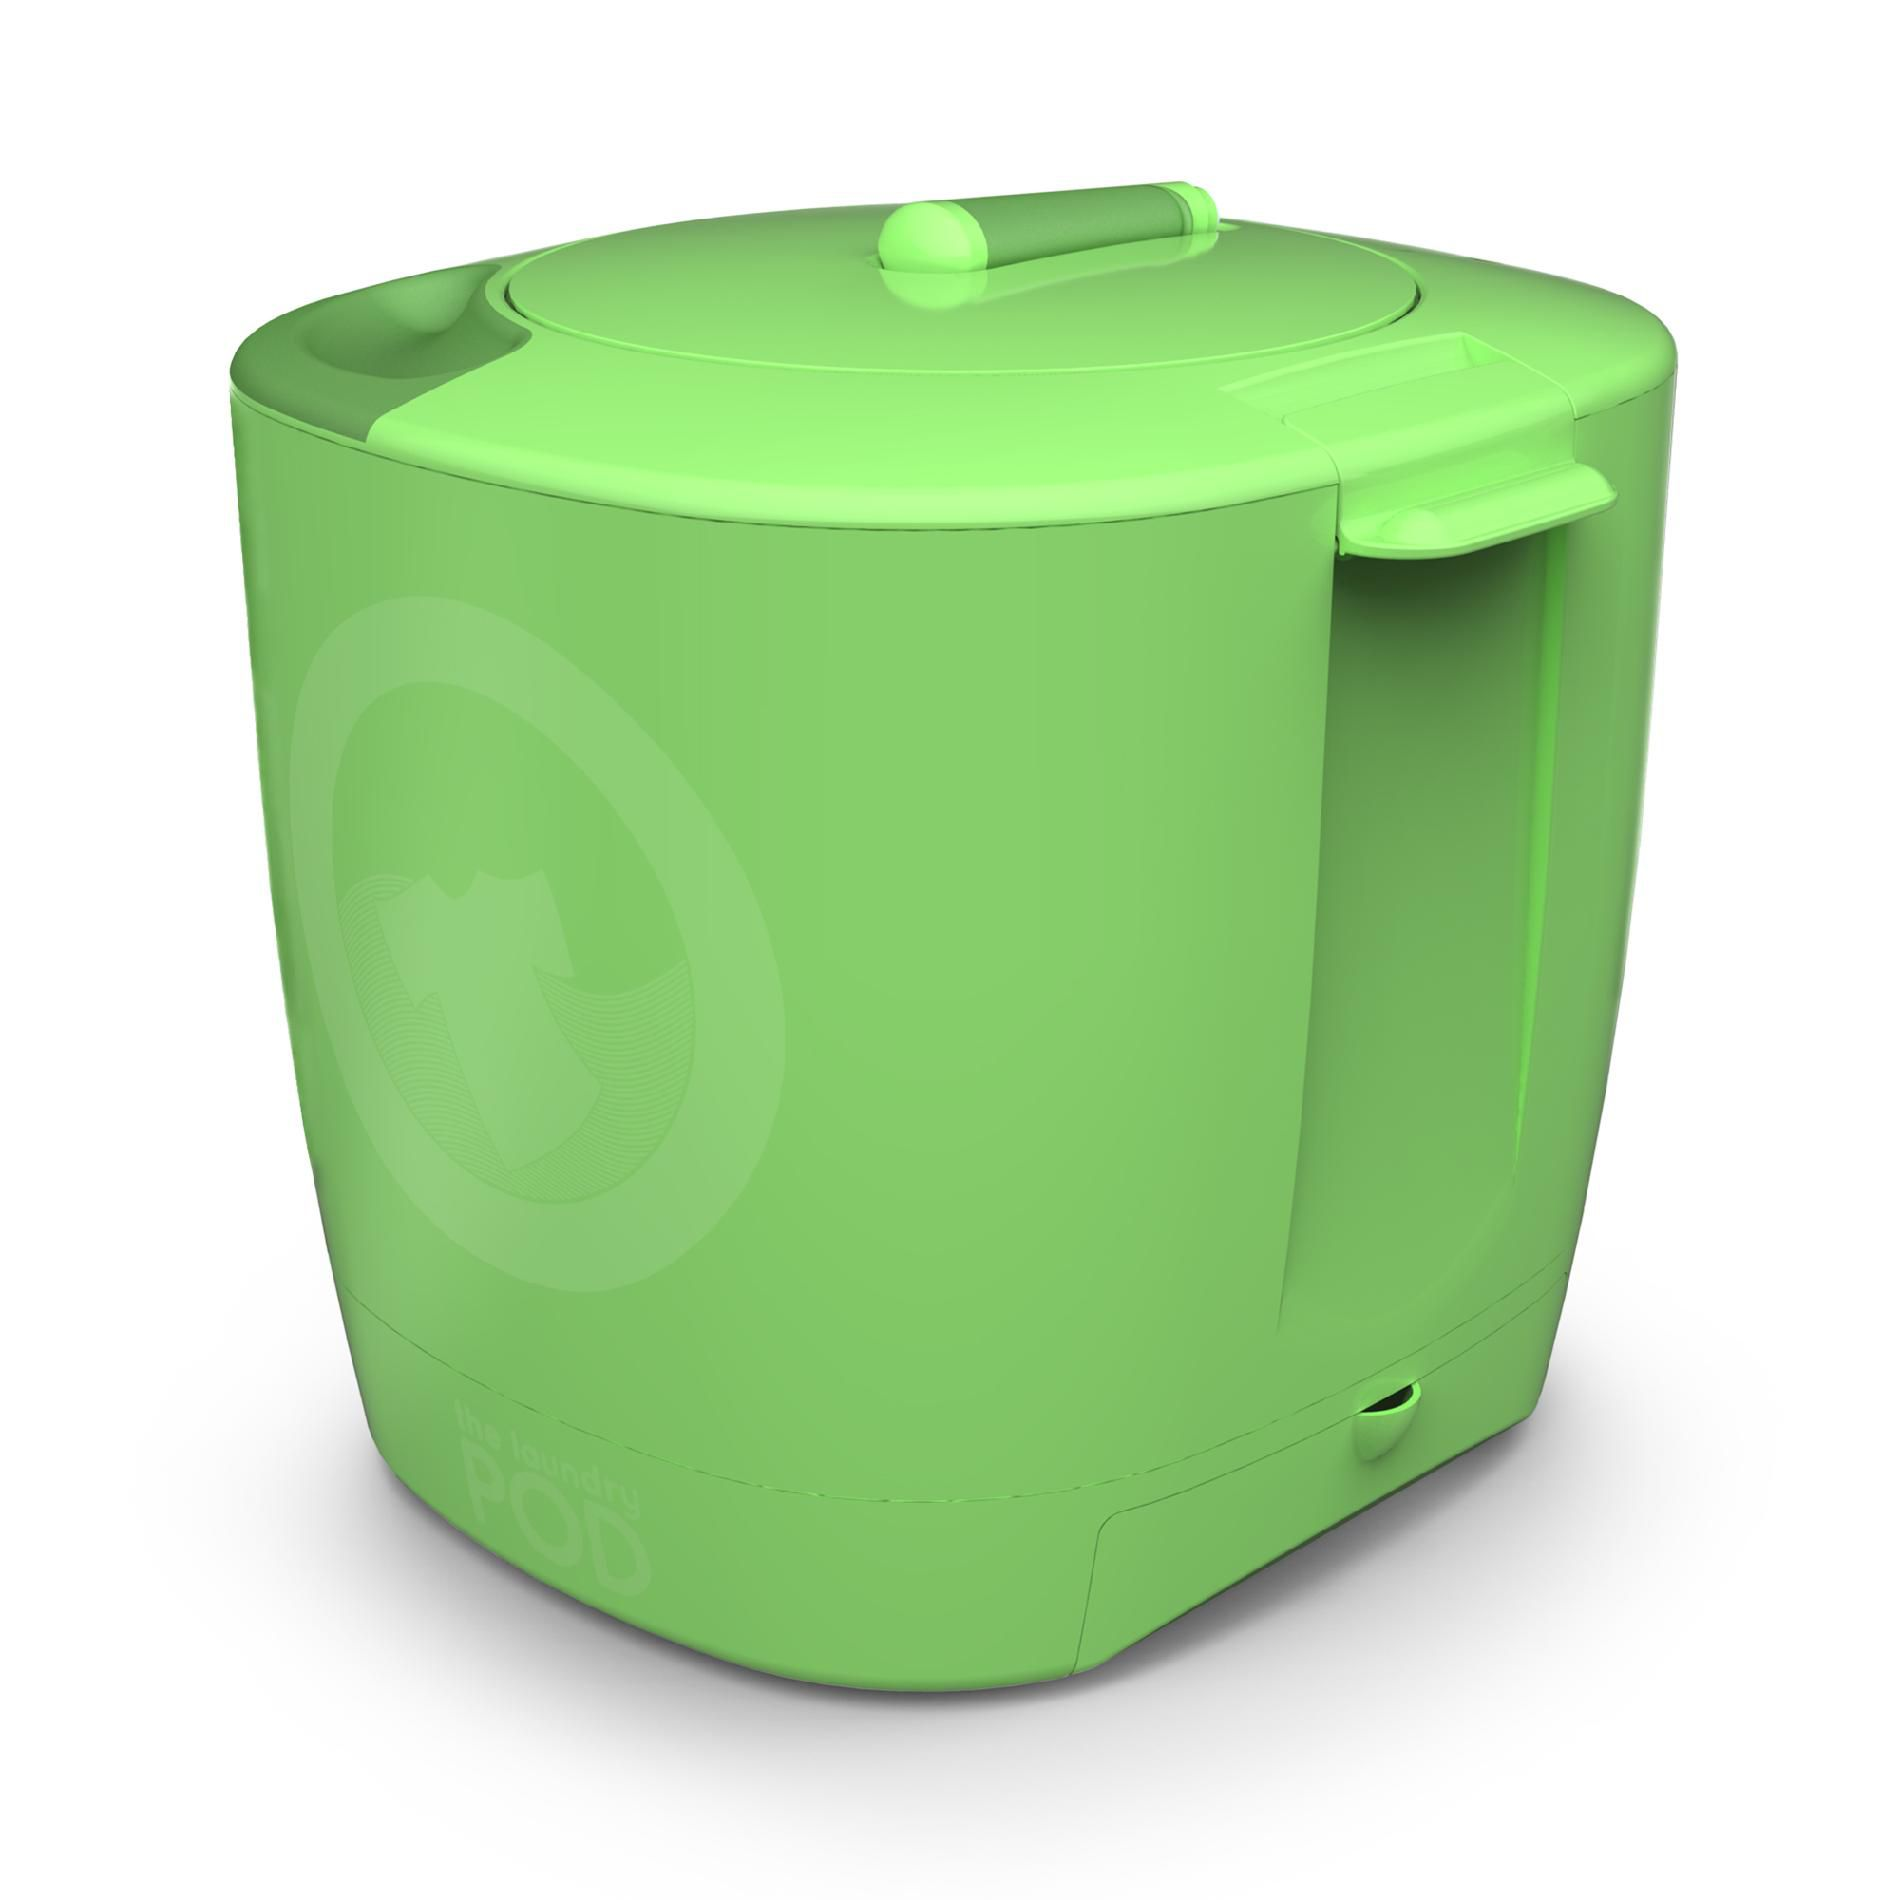 The Laundry POD - Green - Appliances - Specialty Laundry ...